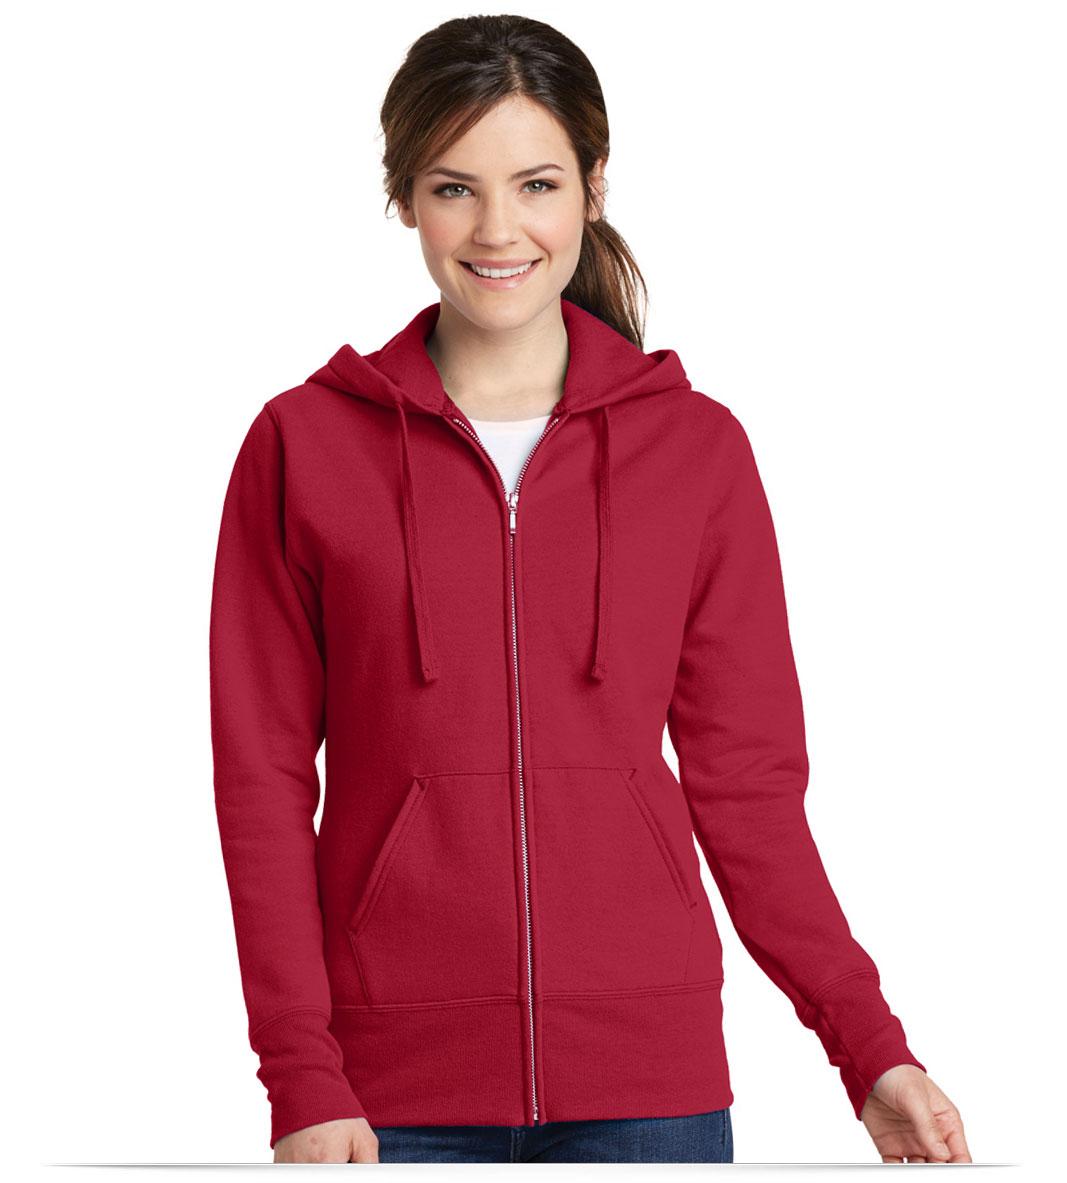 Customize Port and Company Ladies Classic Full-Zip Hoodie